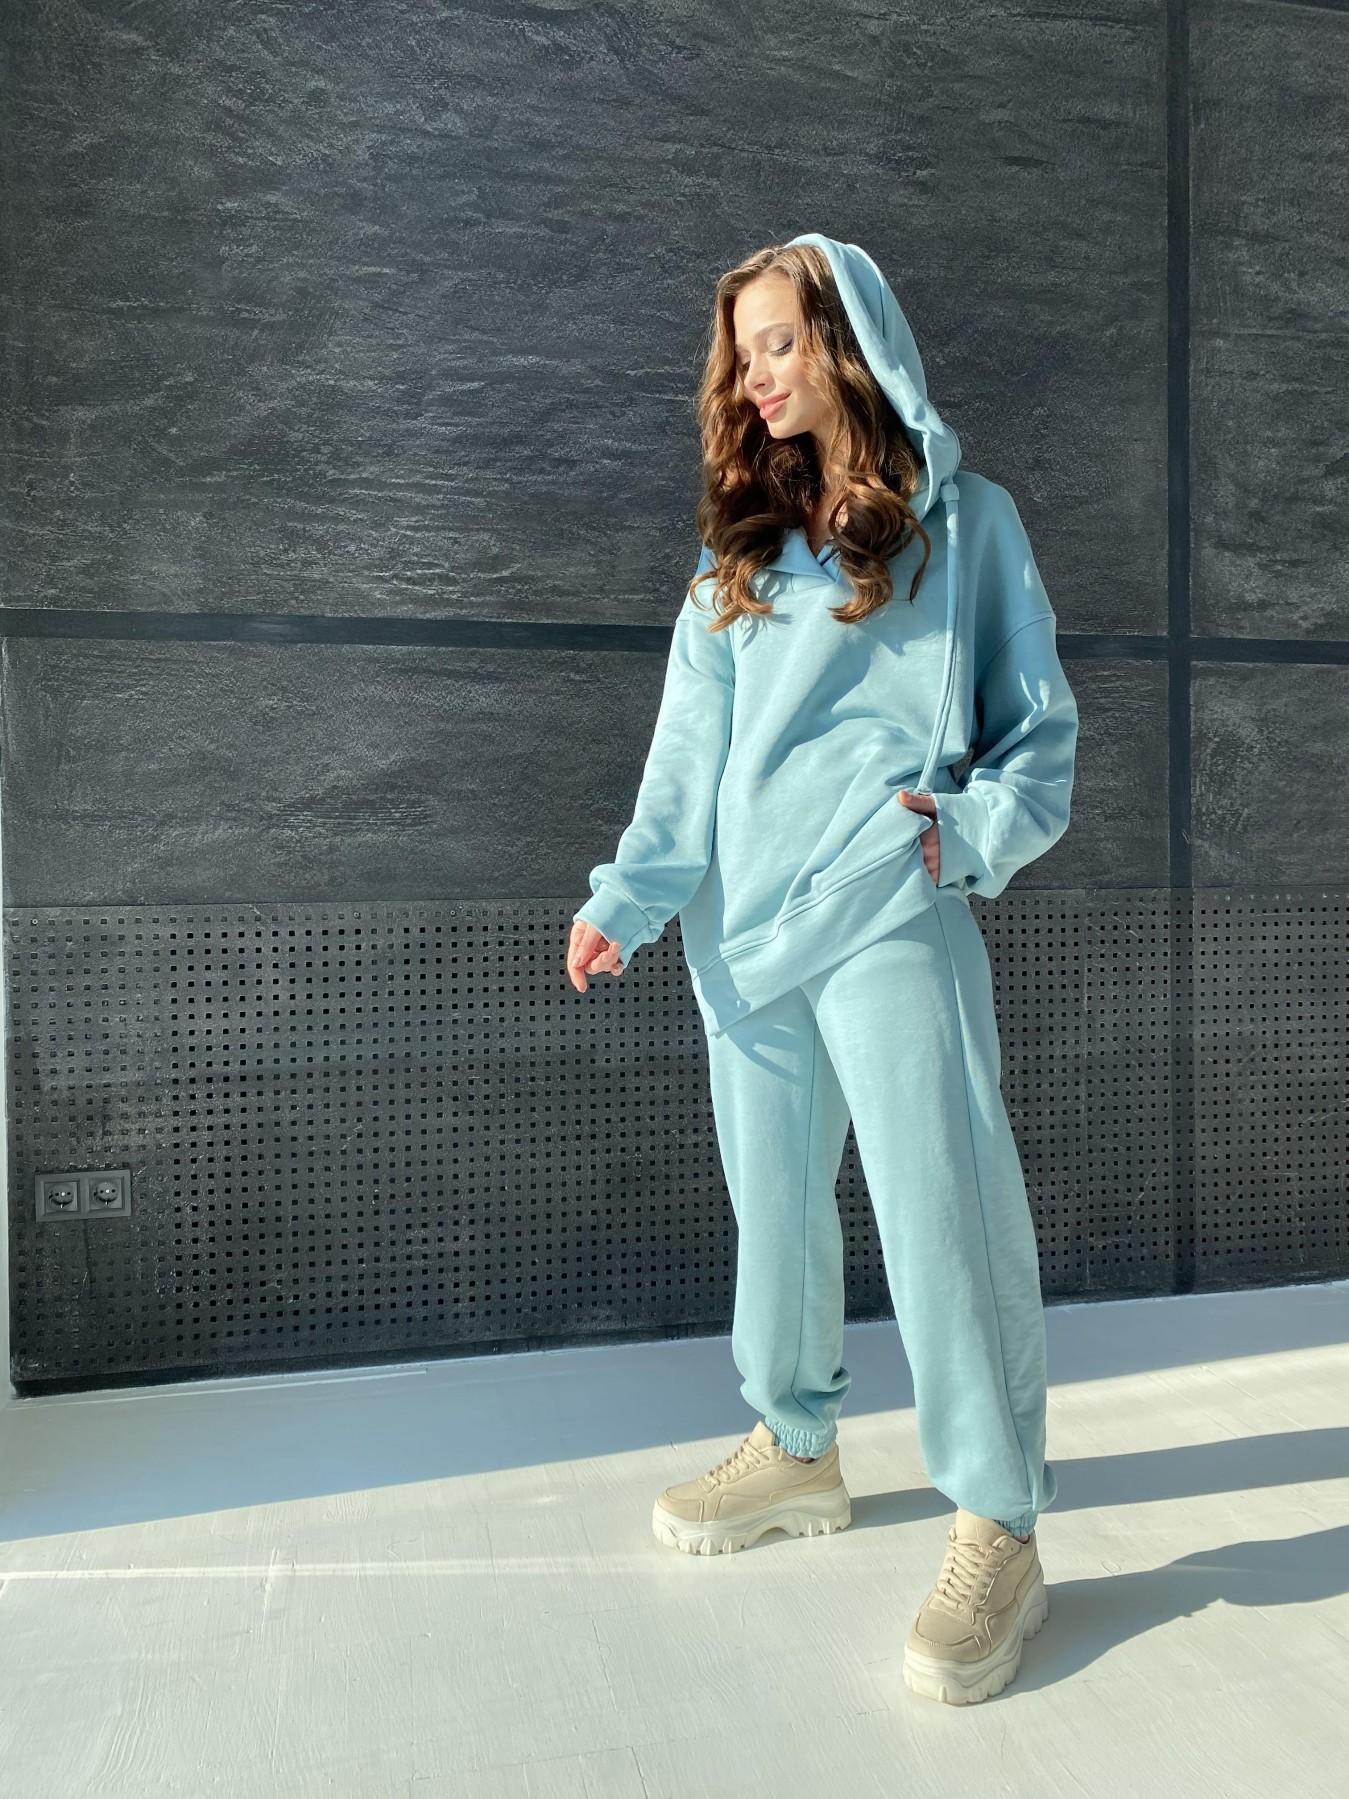 Ярис костюм из 3х нитки 10789 АРТ. 47264 Цвет: Олива - фото 3, интернет магазин tm-modus.ru